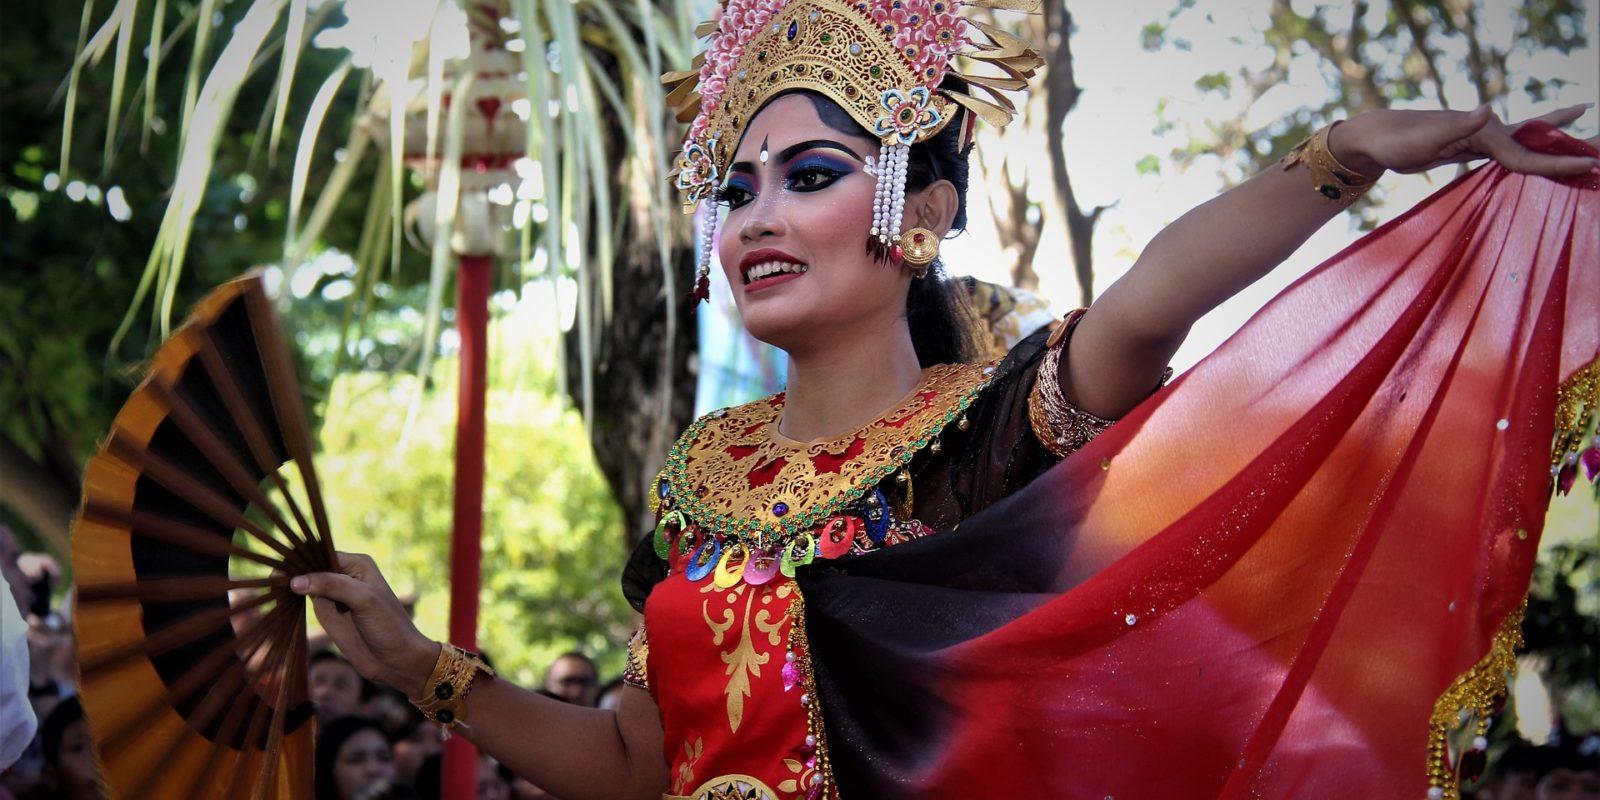 Kecak danseuse, Bali, Indonesia.